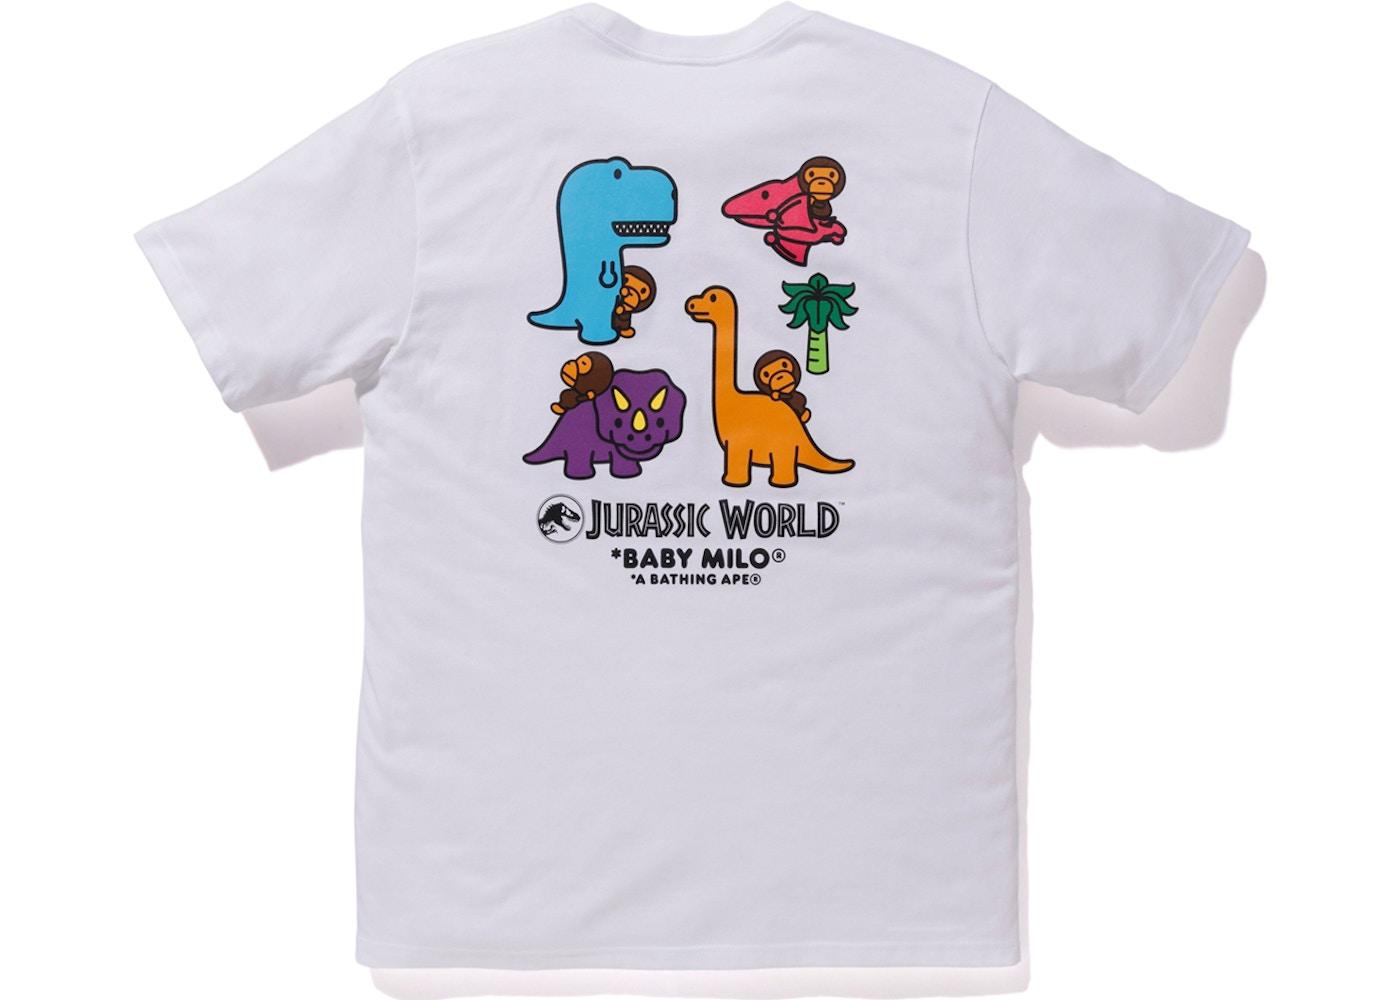 bba7594e BAPE x Jurassic World Baby Milo Dinosaur Tee White - SS18